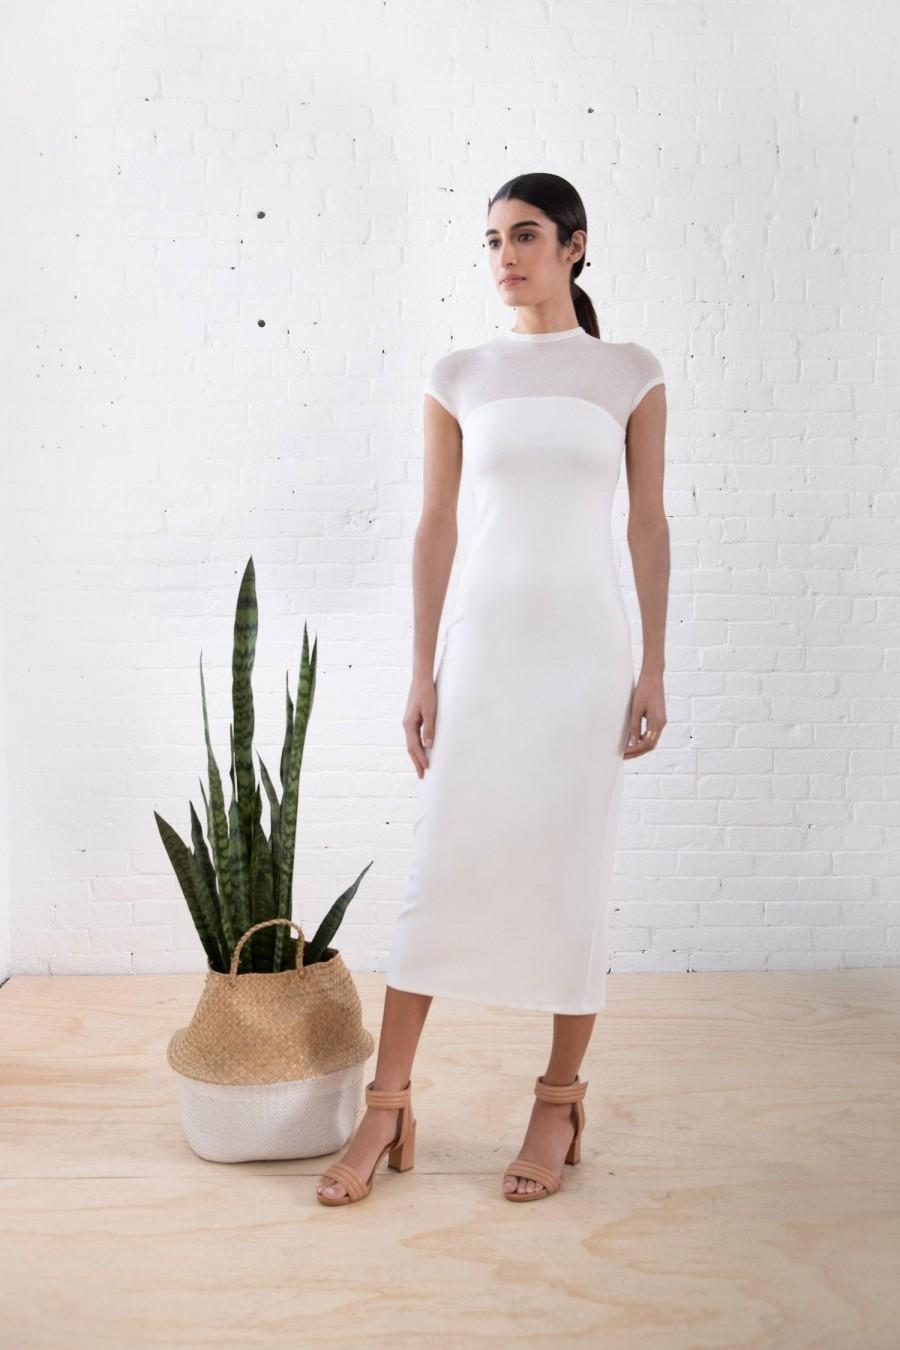 زفاف - A Line Midi Dress, Tea Length Dress, White Evening Dress, White Midi Dress, Elegant Midi Dress, Short Sleeve Dress, Miranda Dress, MD1251